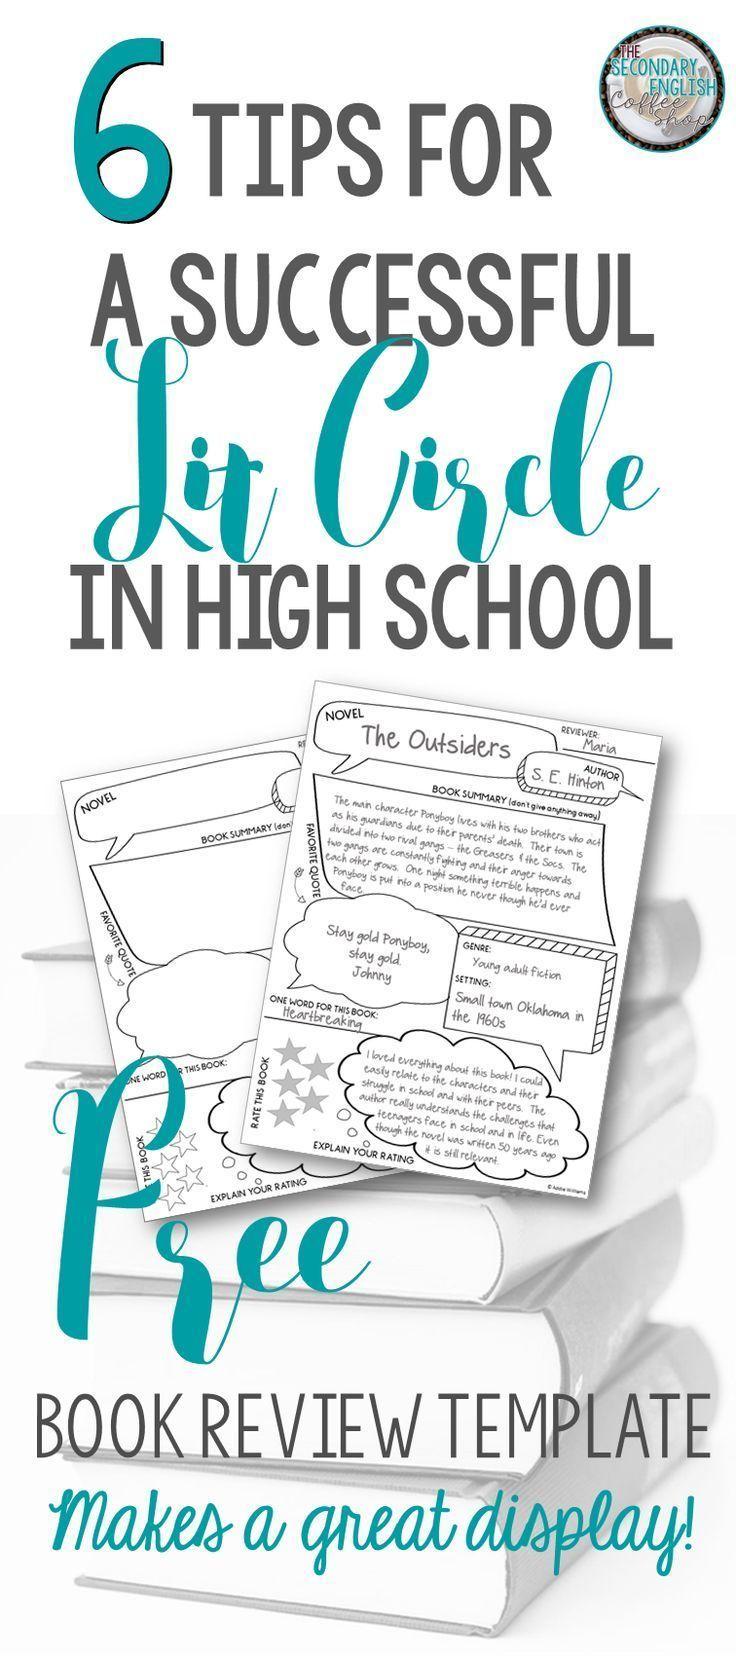 Workbooks literature circles roles worksheets : The 25+ best Literature circles ideas on Pinterest | 5th grade ...